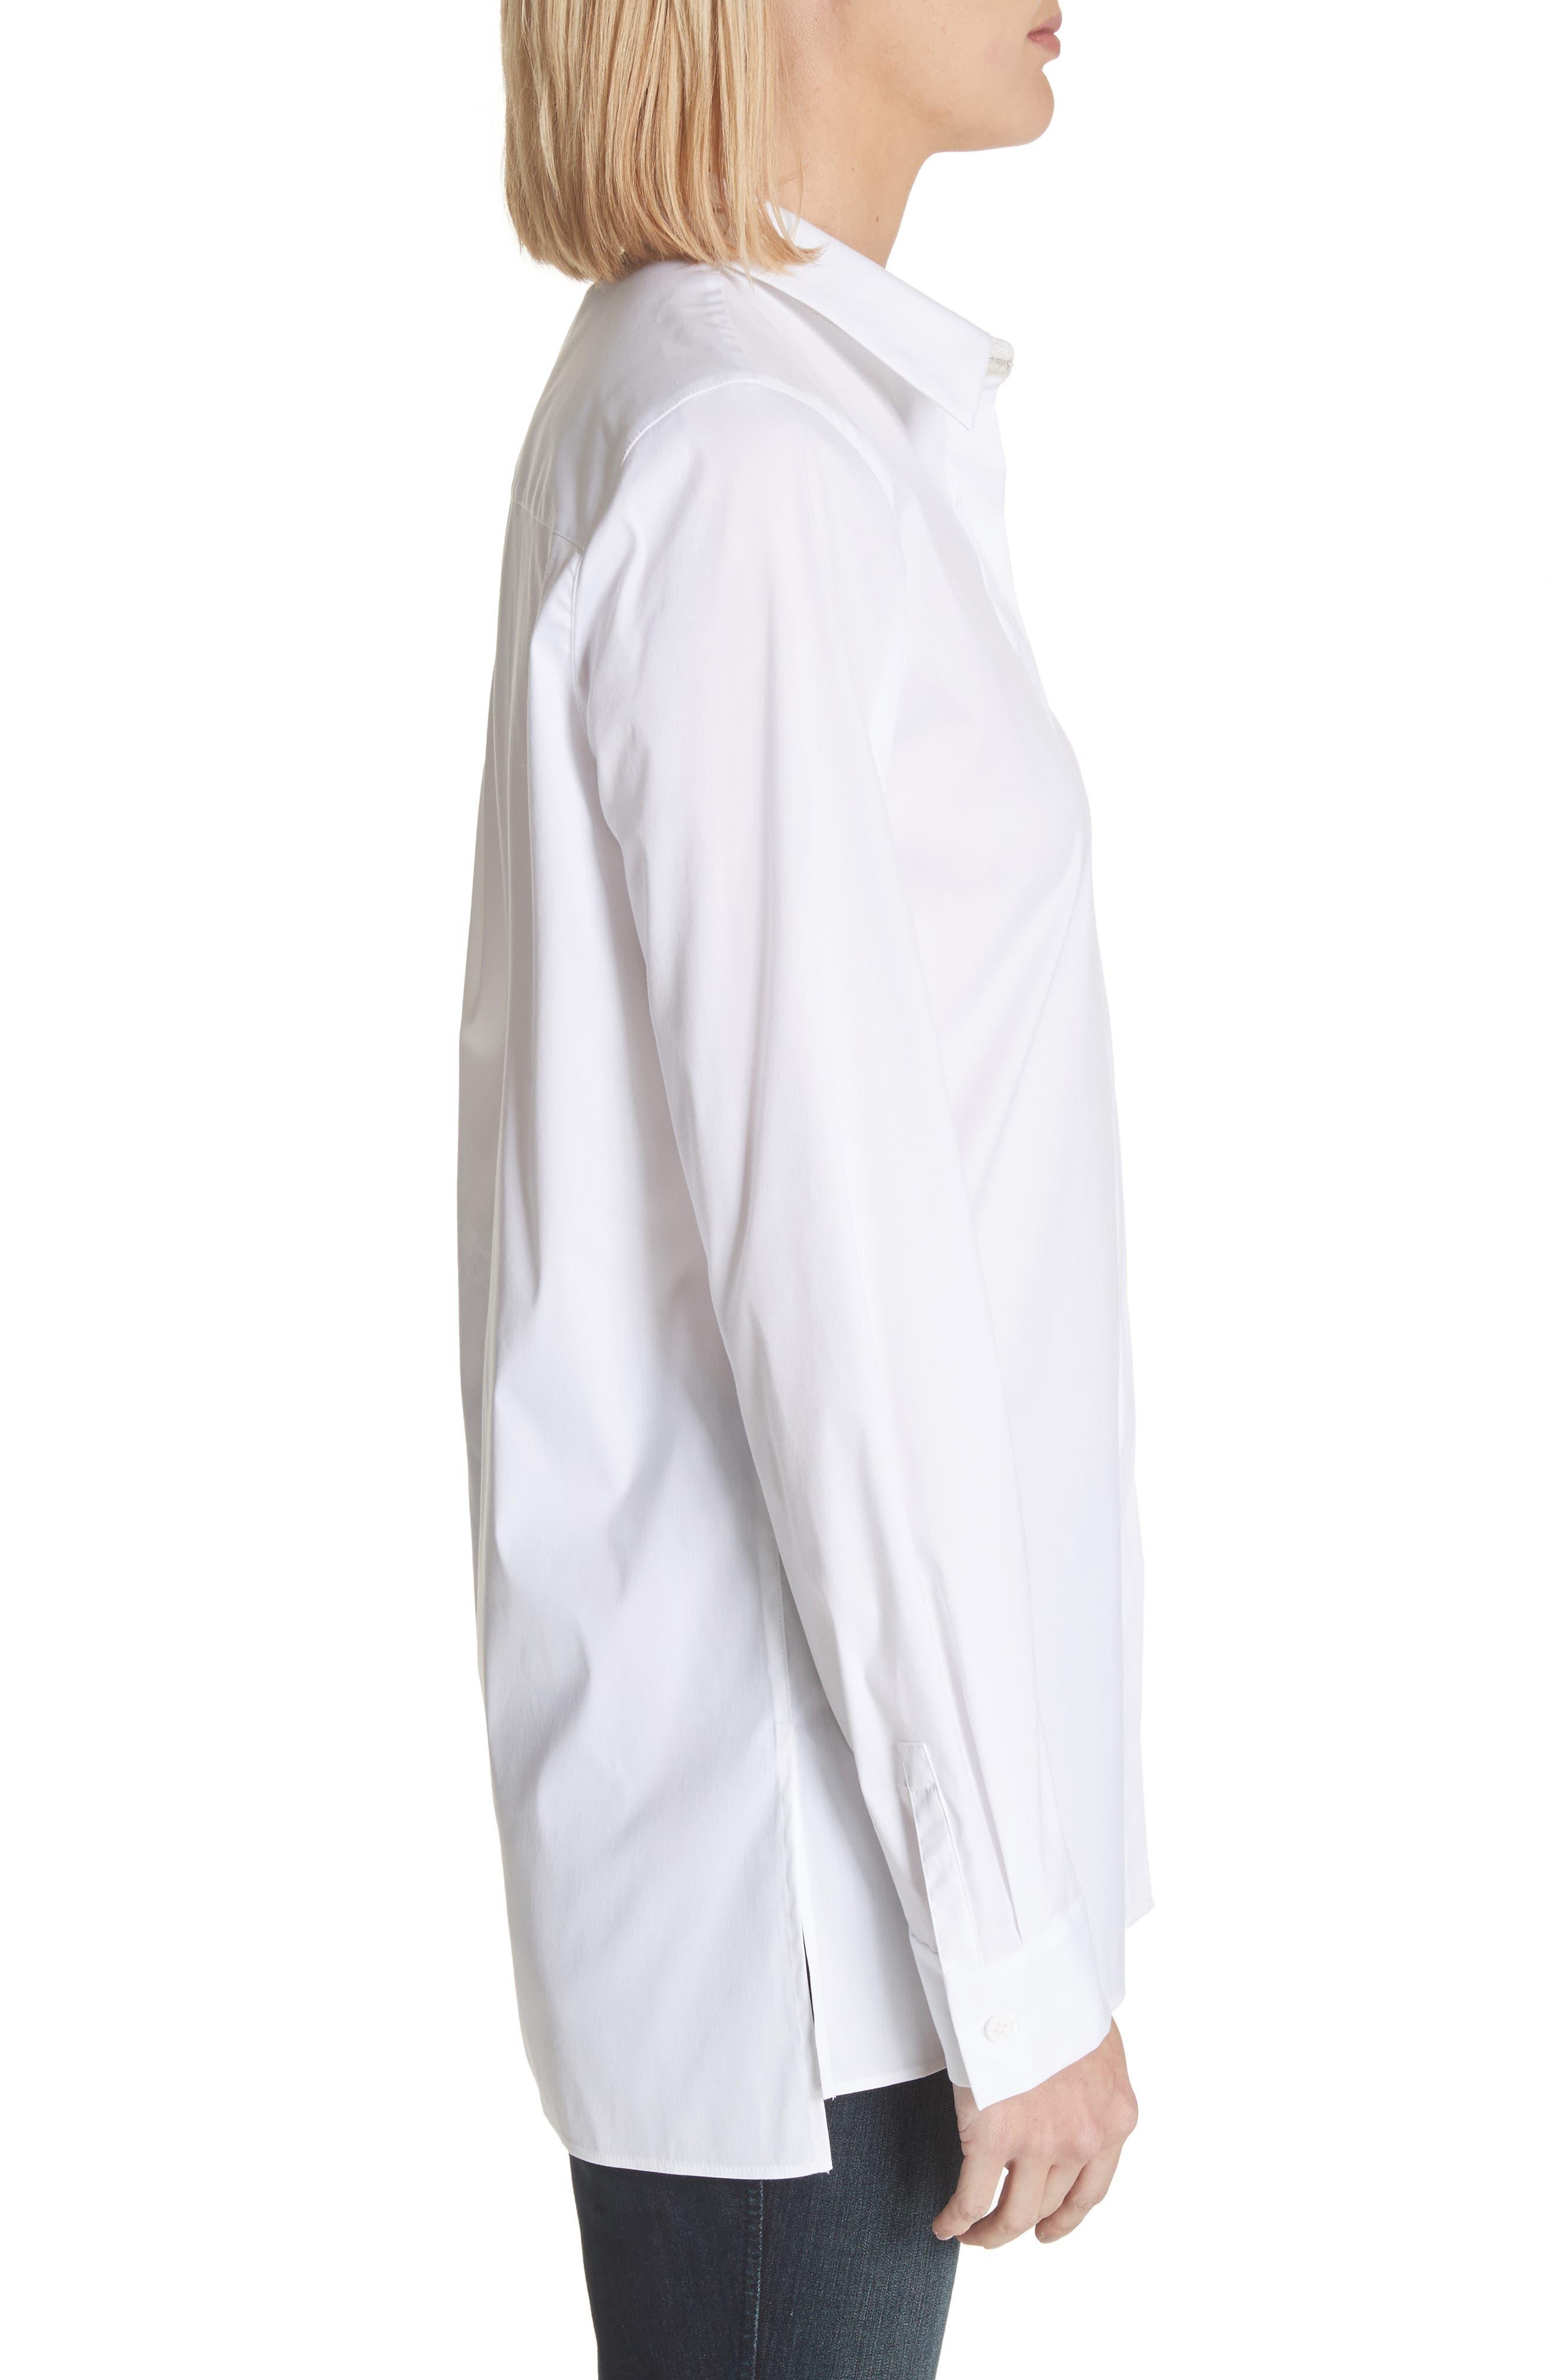 Brayden Excursion Stretch Blouse,                             Alternate thumbnail 3, color,                             White